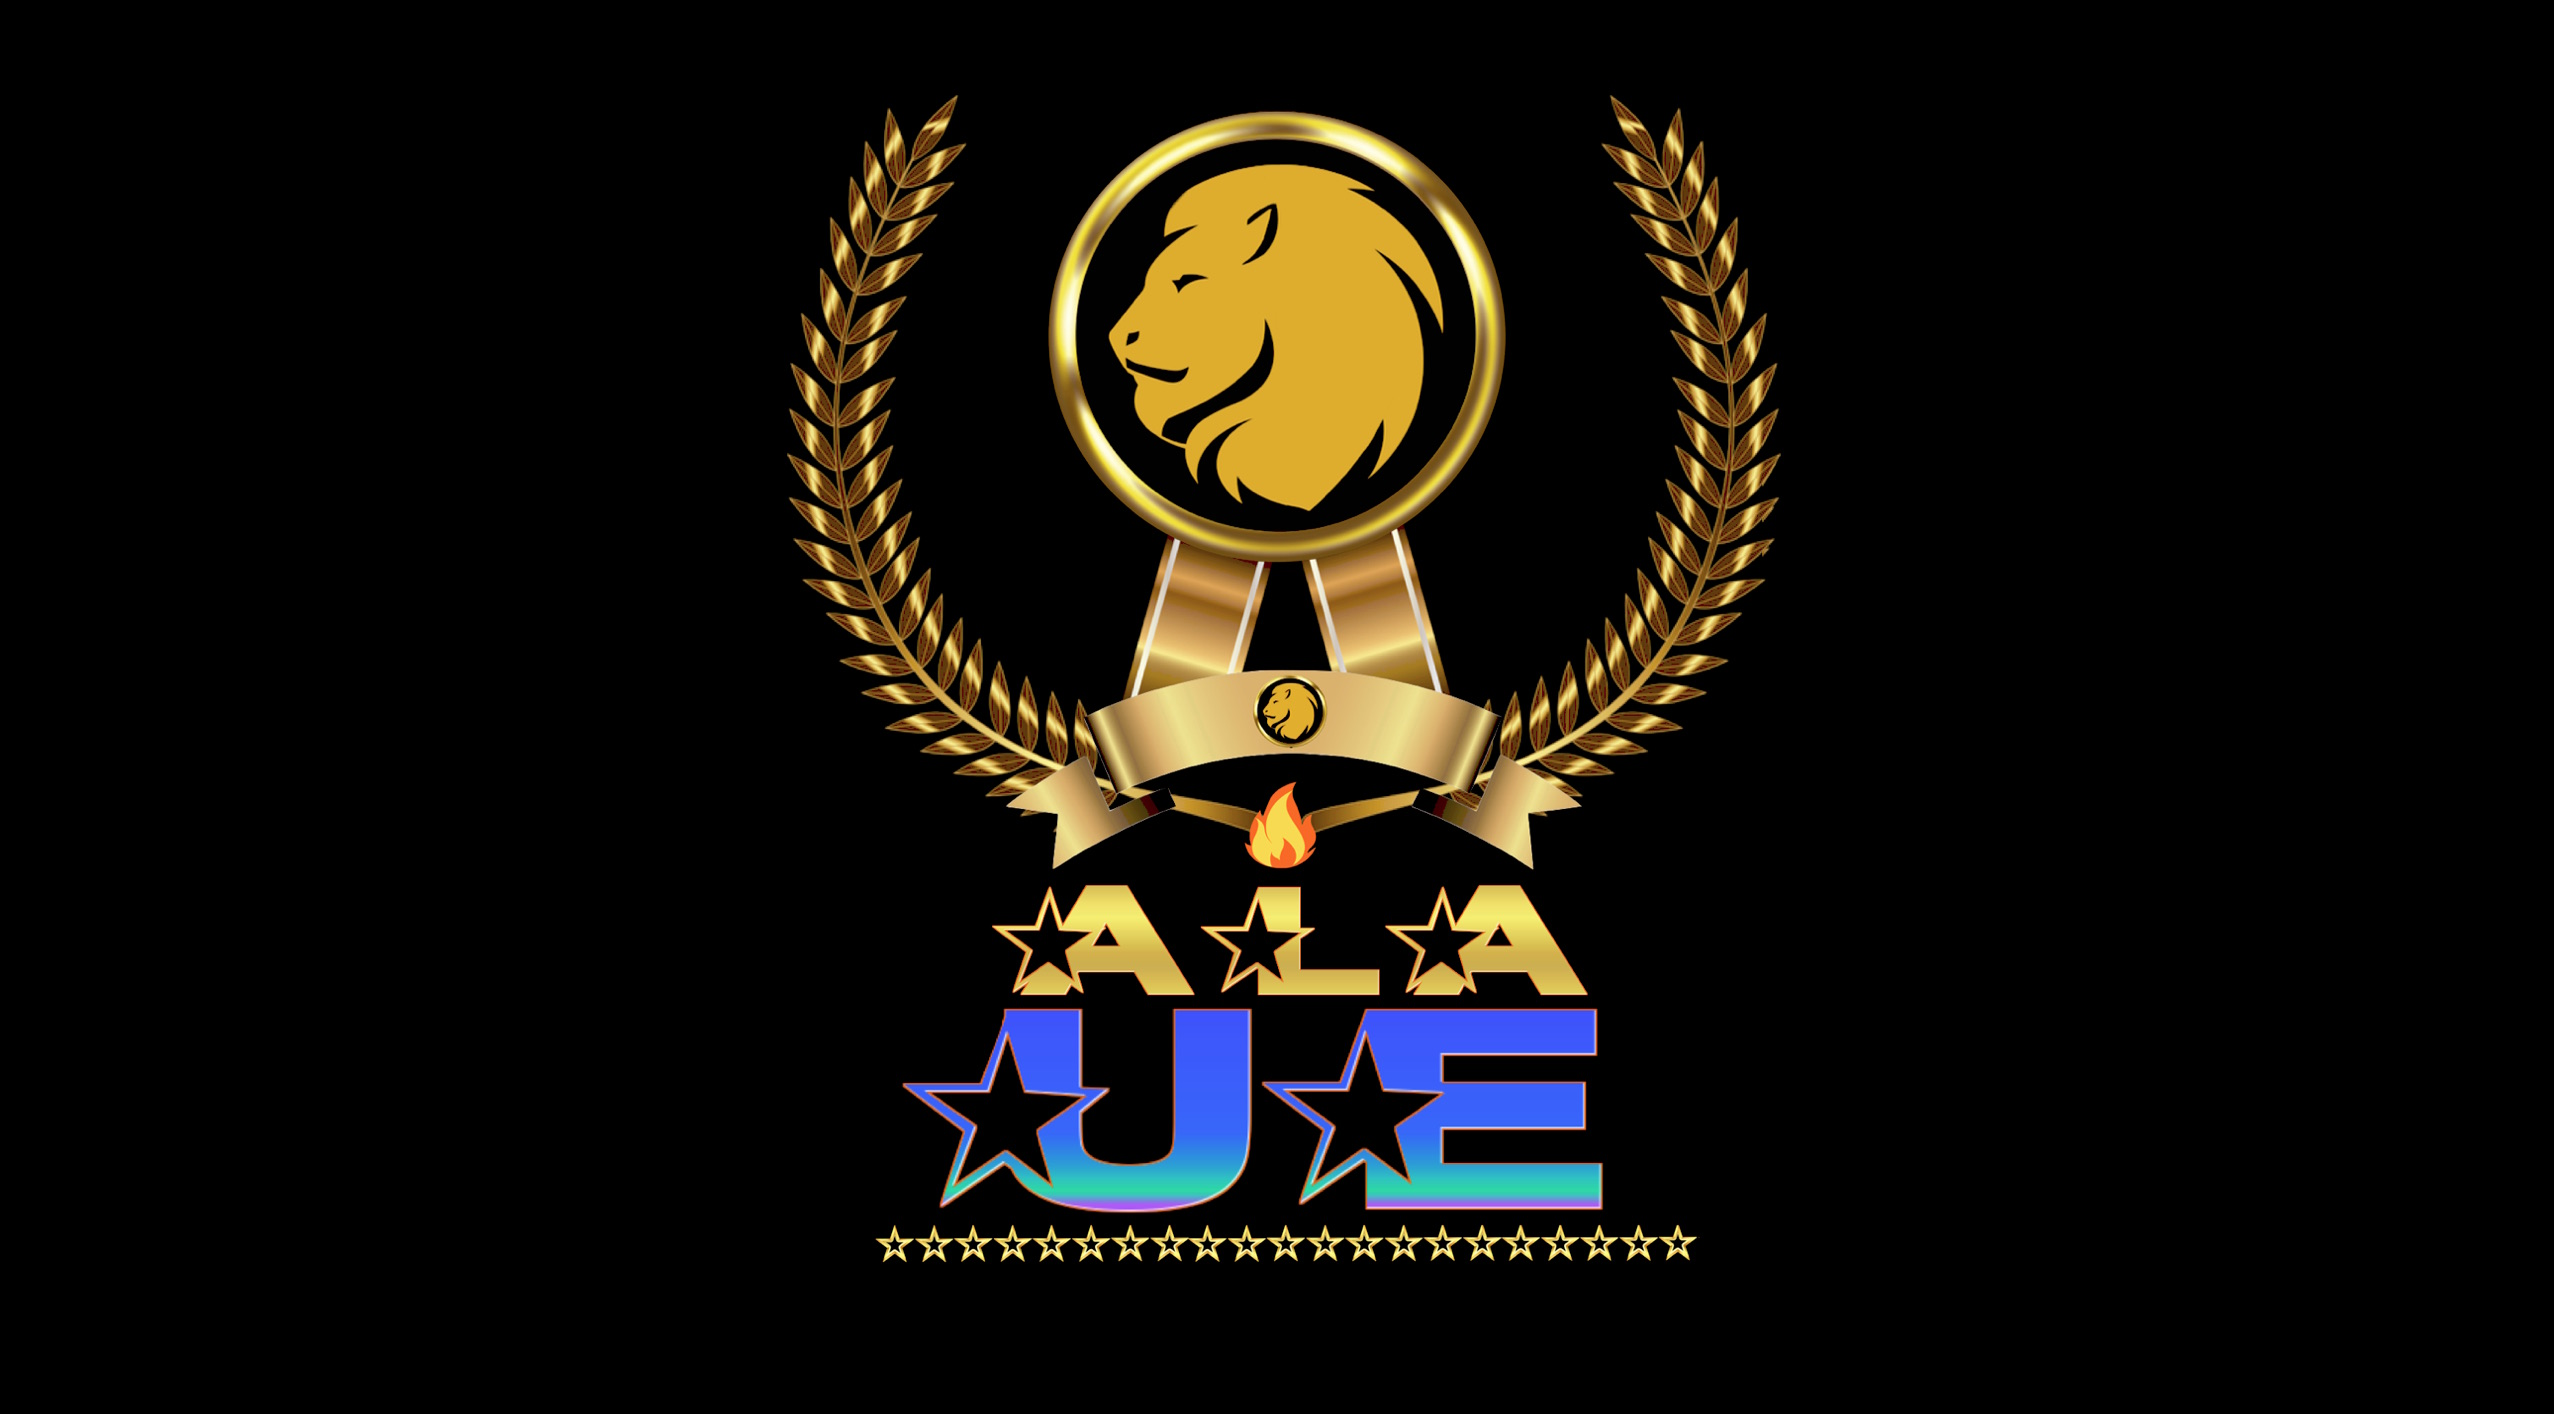 Le triptyque ALA à trois axes: #ALA_UE, #ALA_AFRICA, #ALA_USA